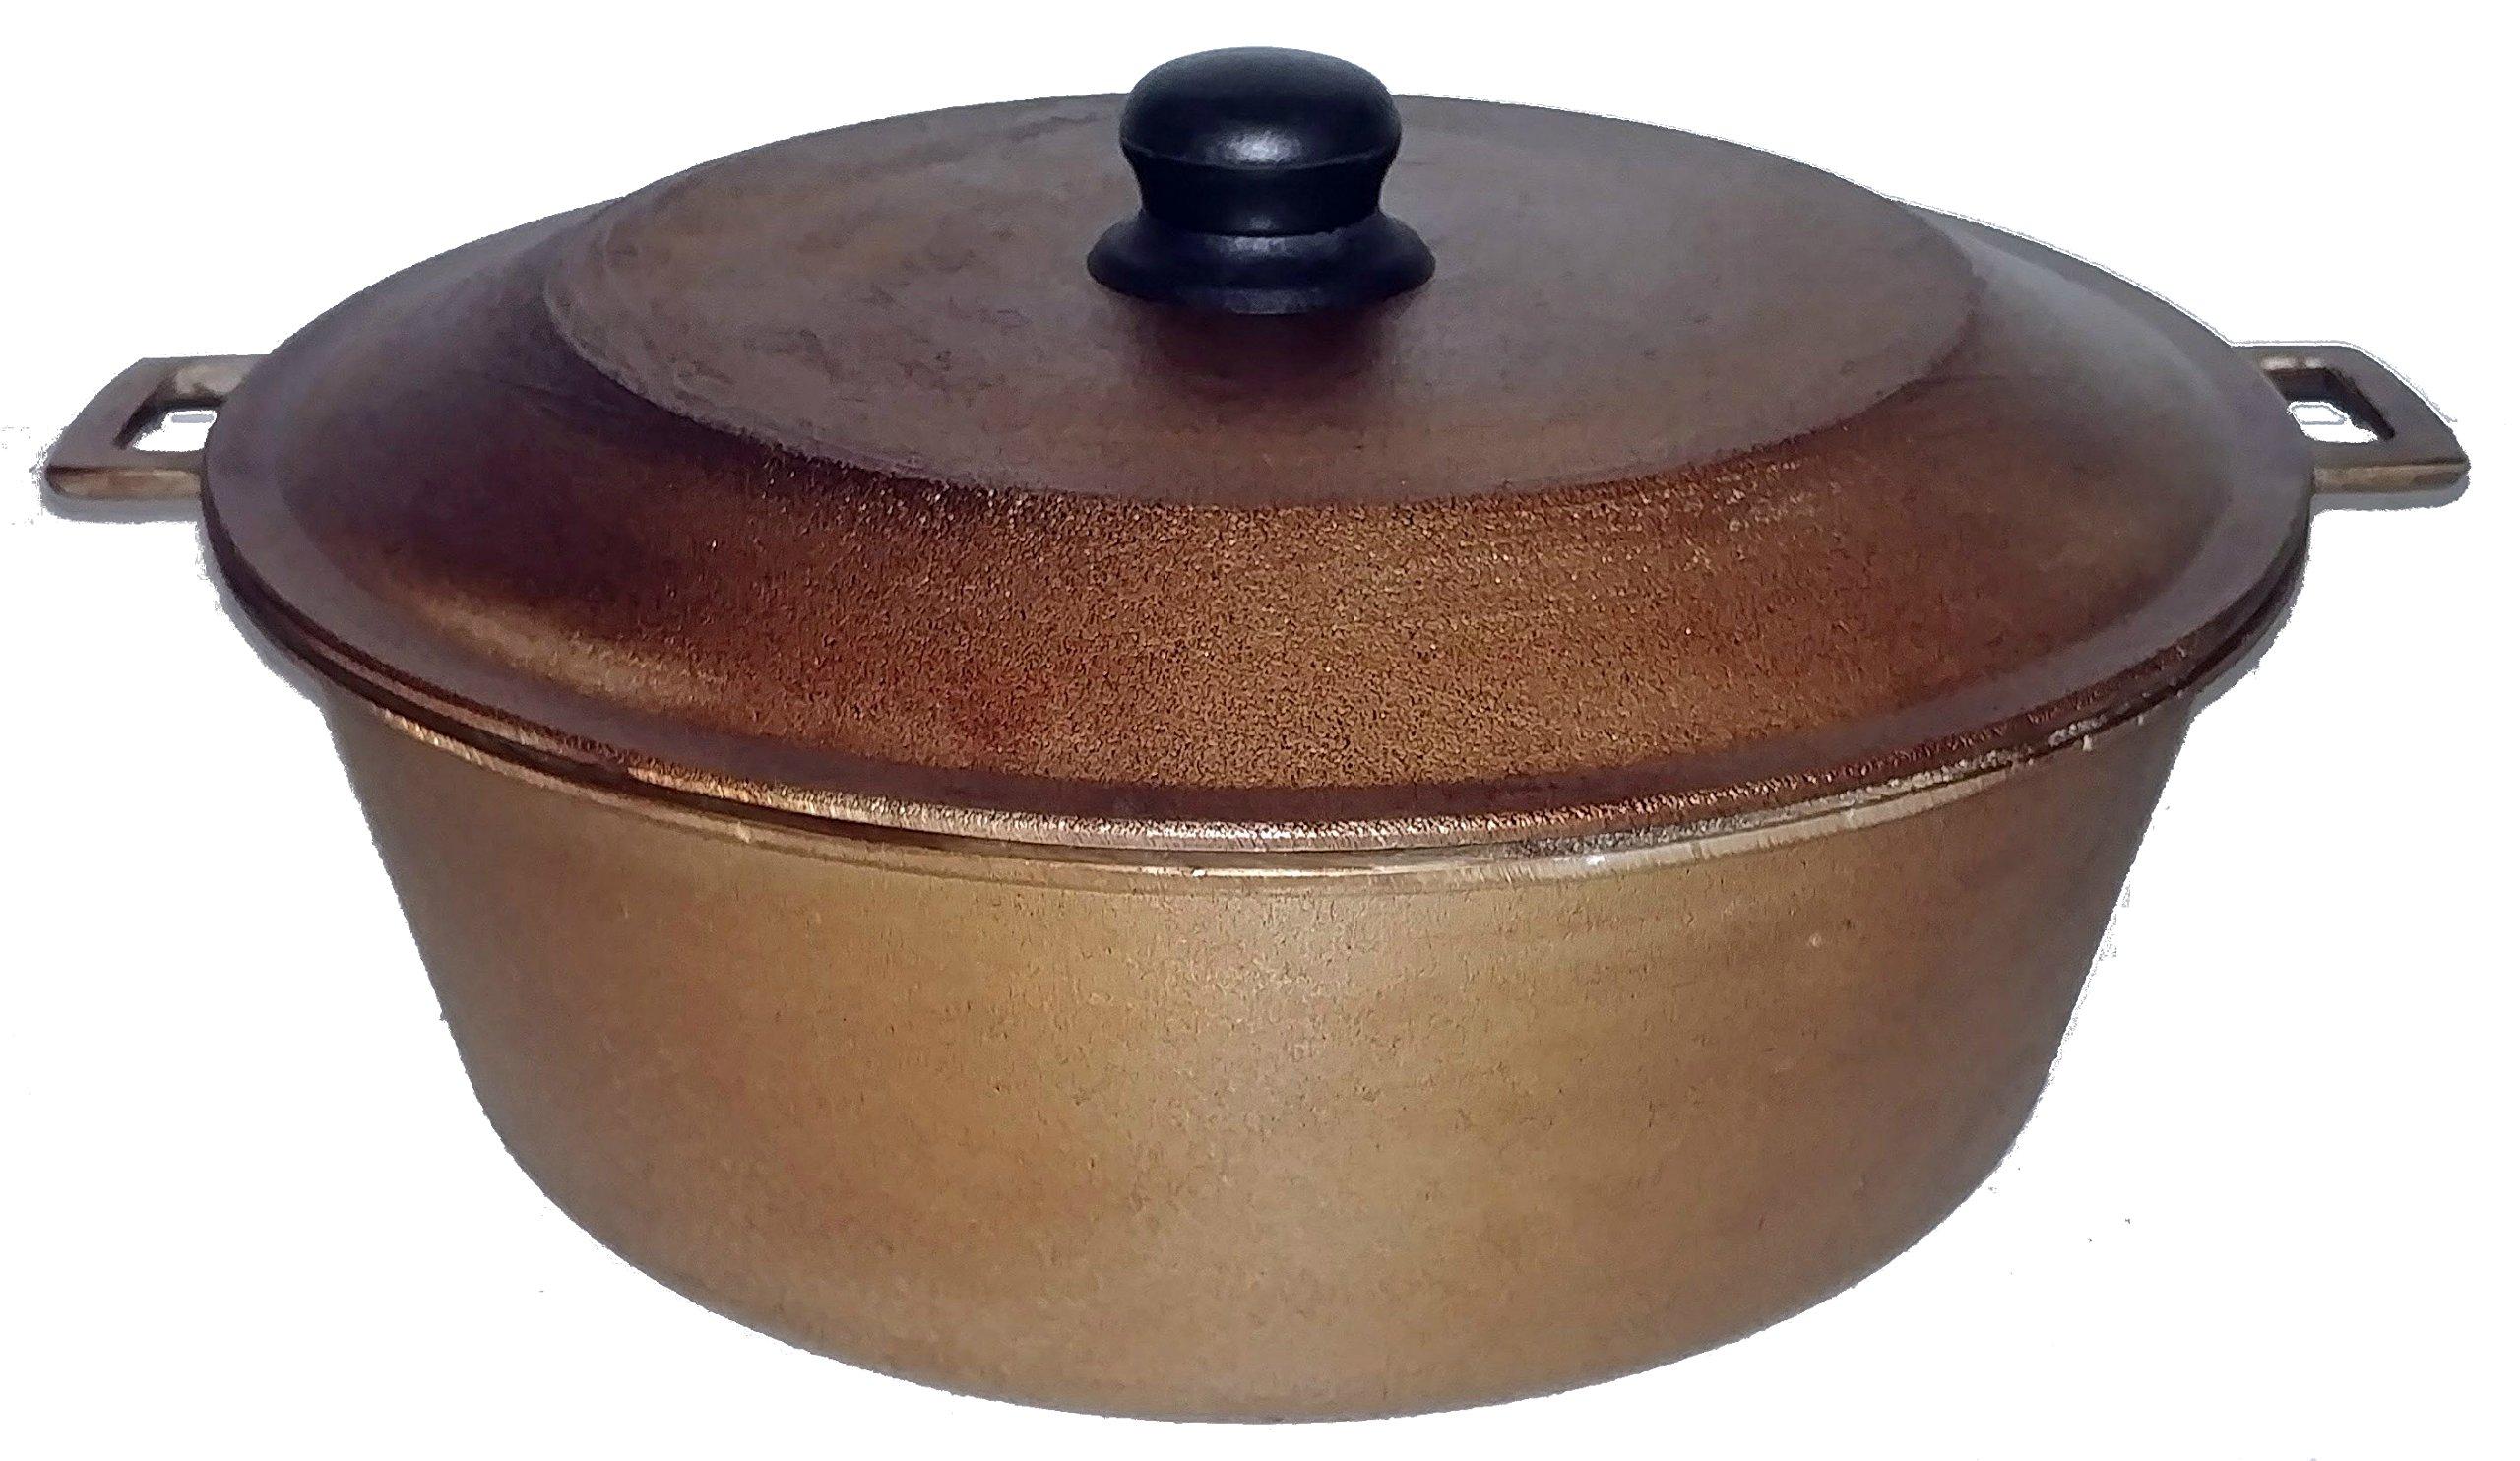 GauchogrillX Caldero Curado 14'' (36cm) 8 Quart (7,6lt) Dutch Oven Seasoned Rust Resistant Hecho en Venezuela